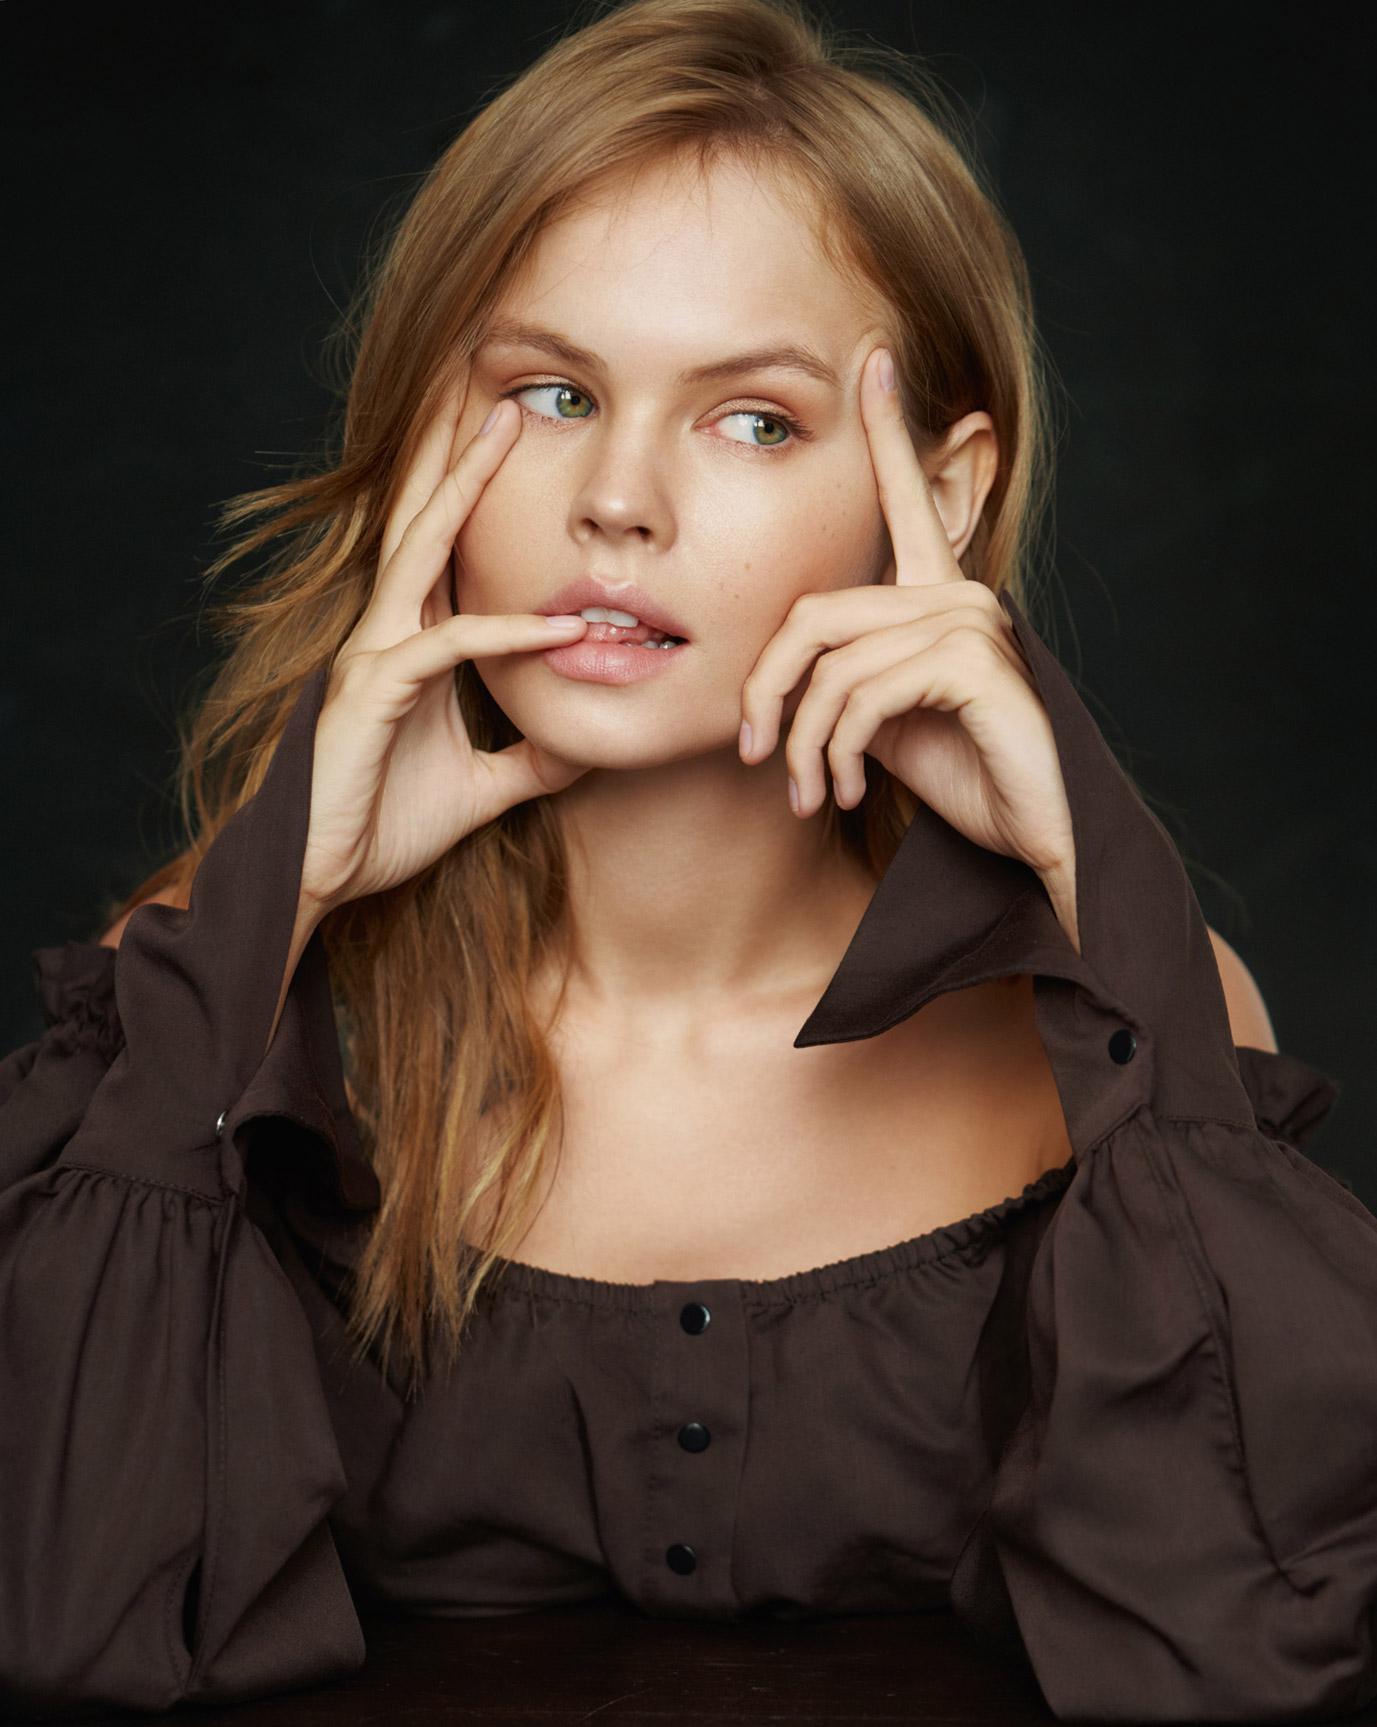 Анастасия Щеглова, фотограф Константин Крюковский / фото 12